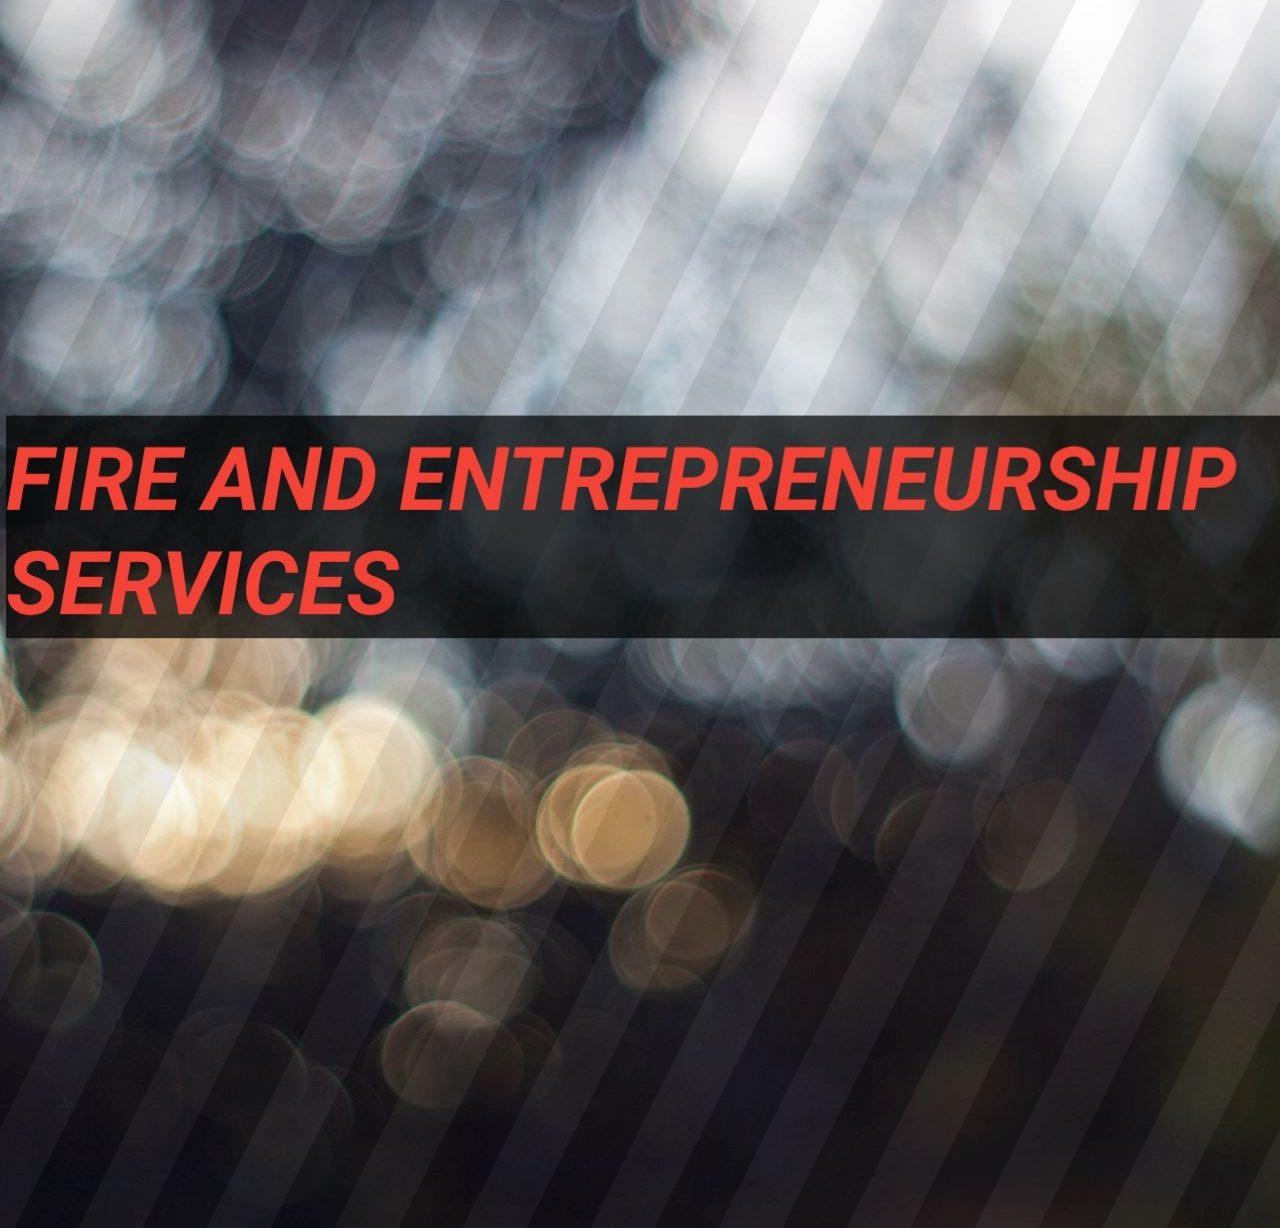 Fire and Entrepreneurship Services